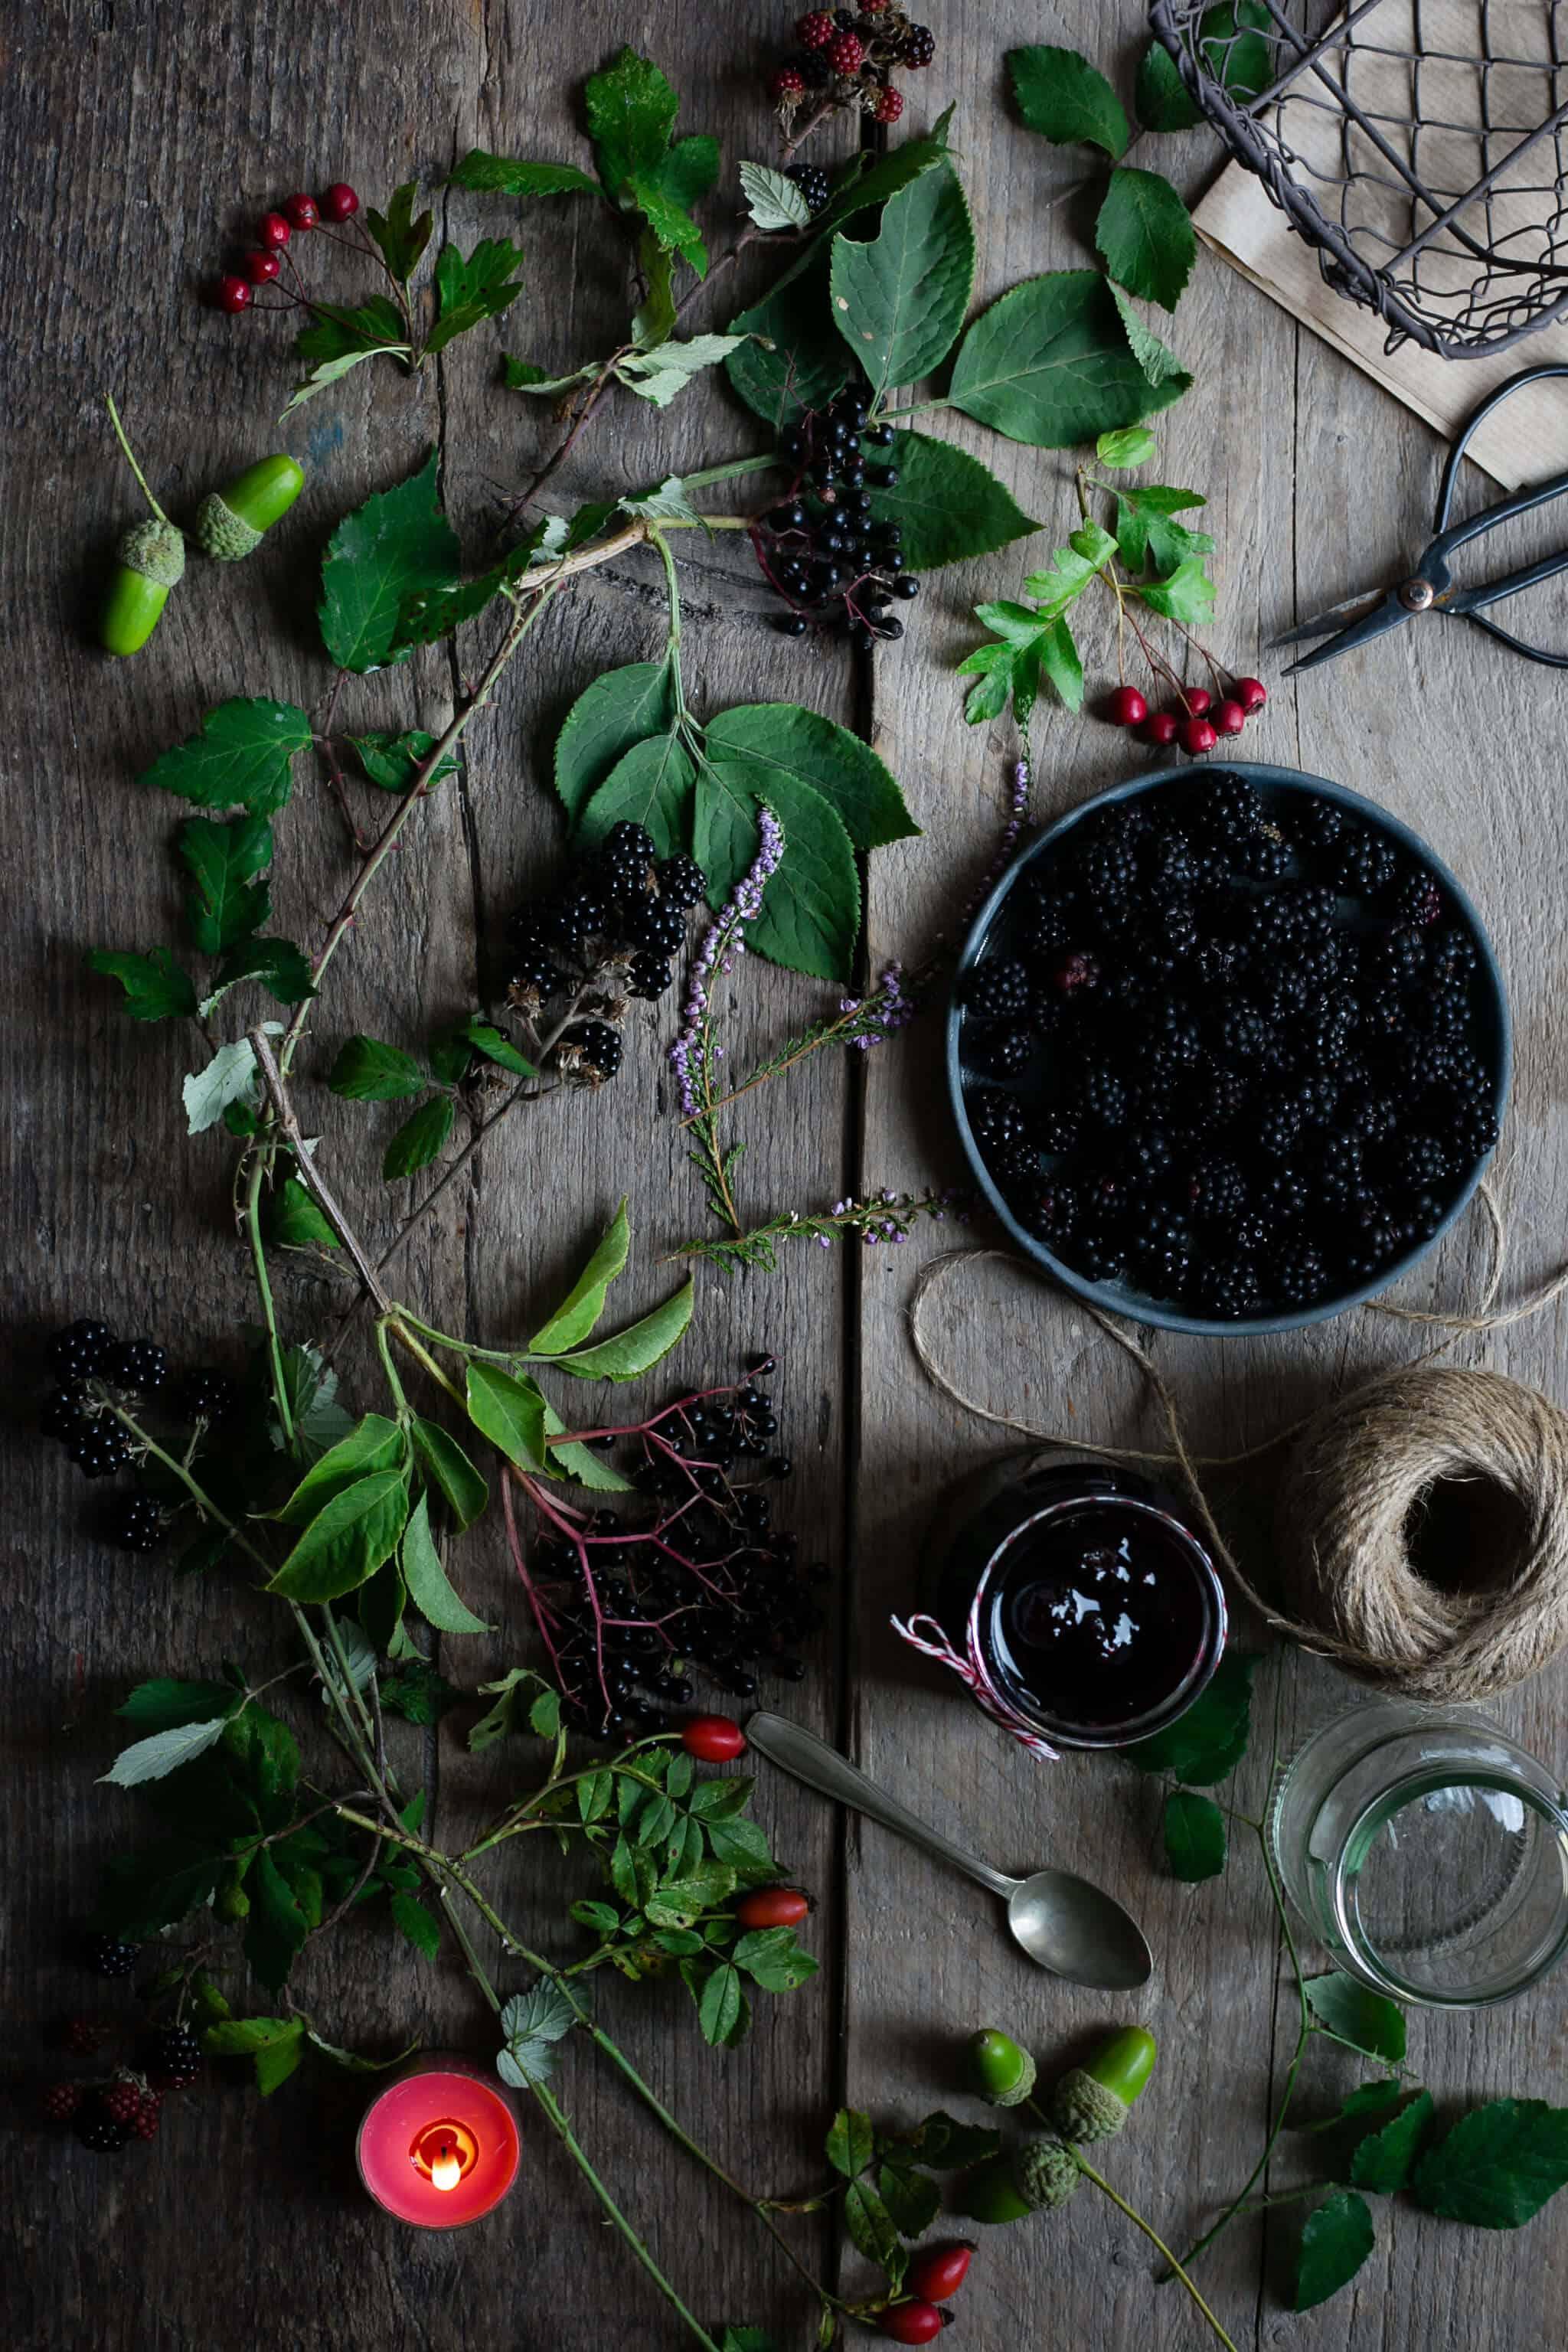 Berry jam lattice tart, made with wild blackberries | via @annabanana.co